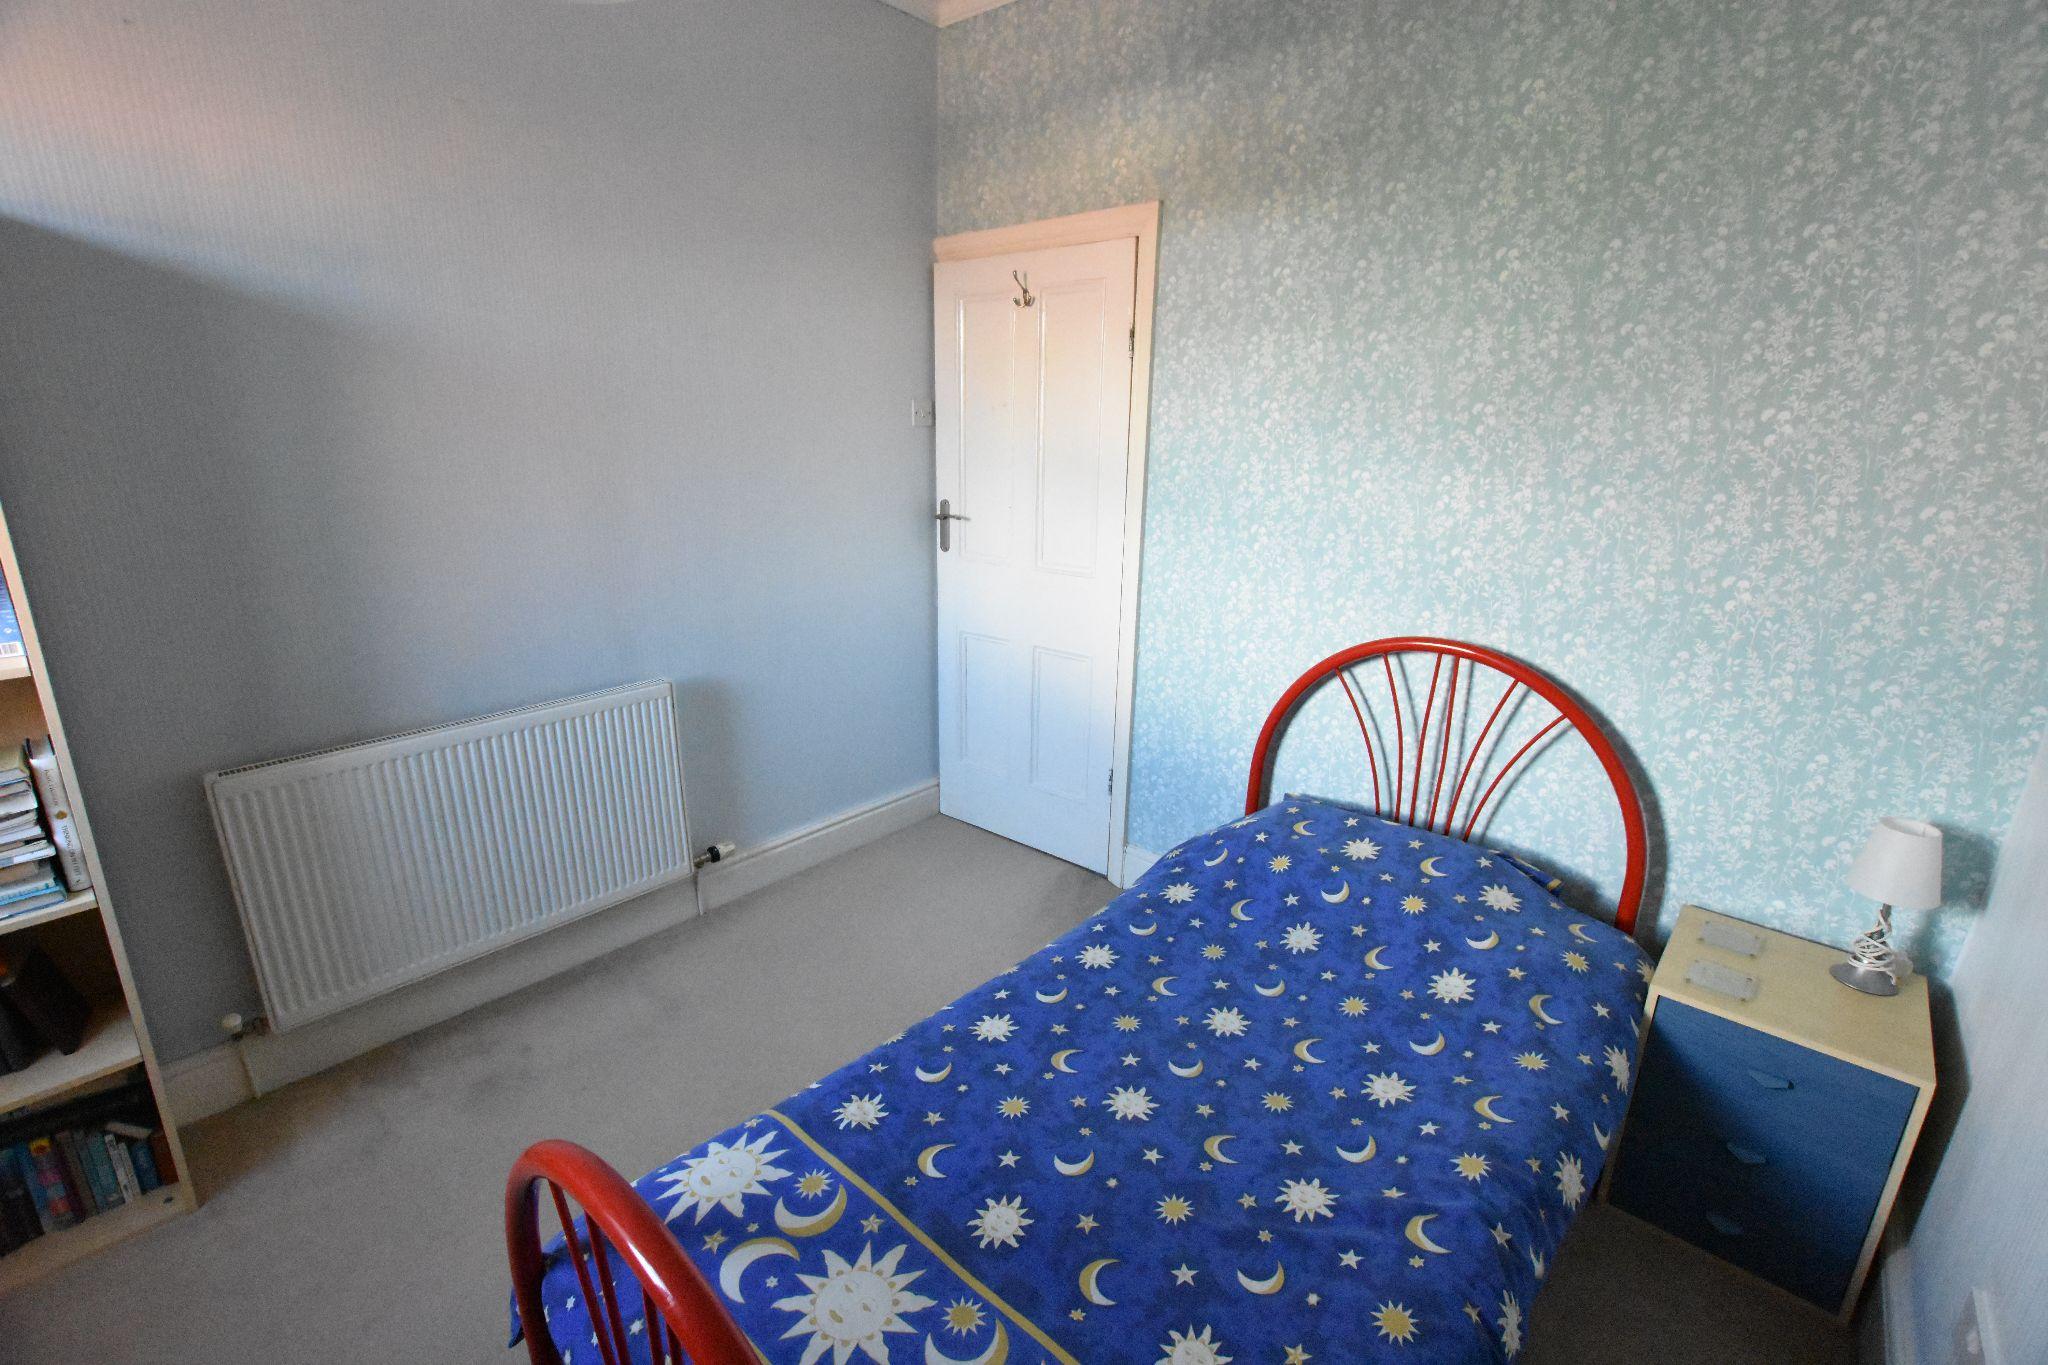 3 bedroom semi-detached house Sold STC in Preston - Bedroom 2